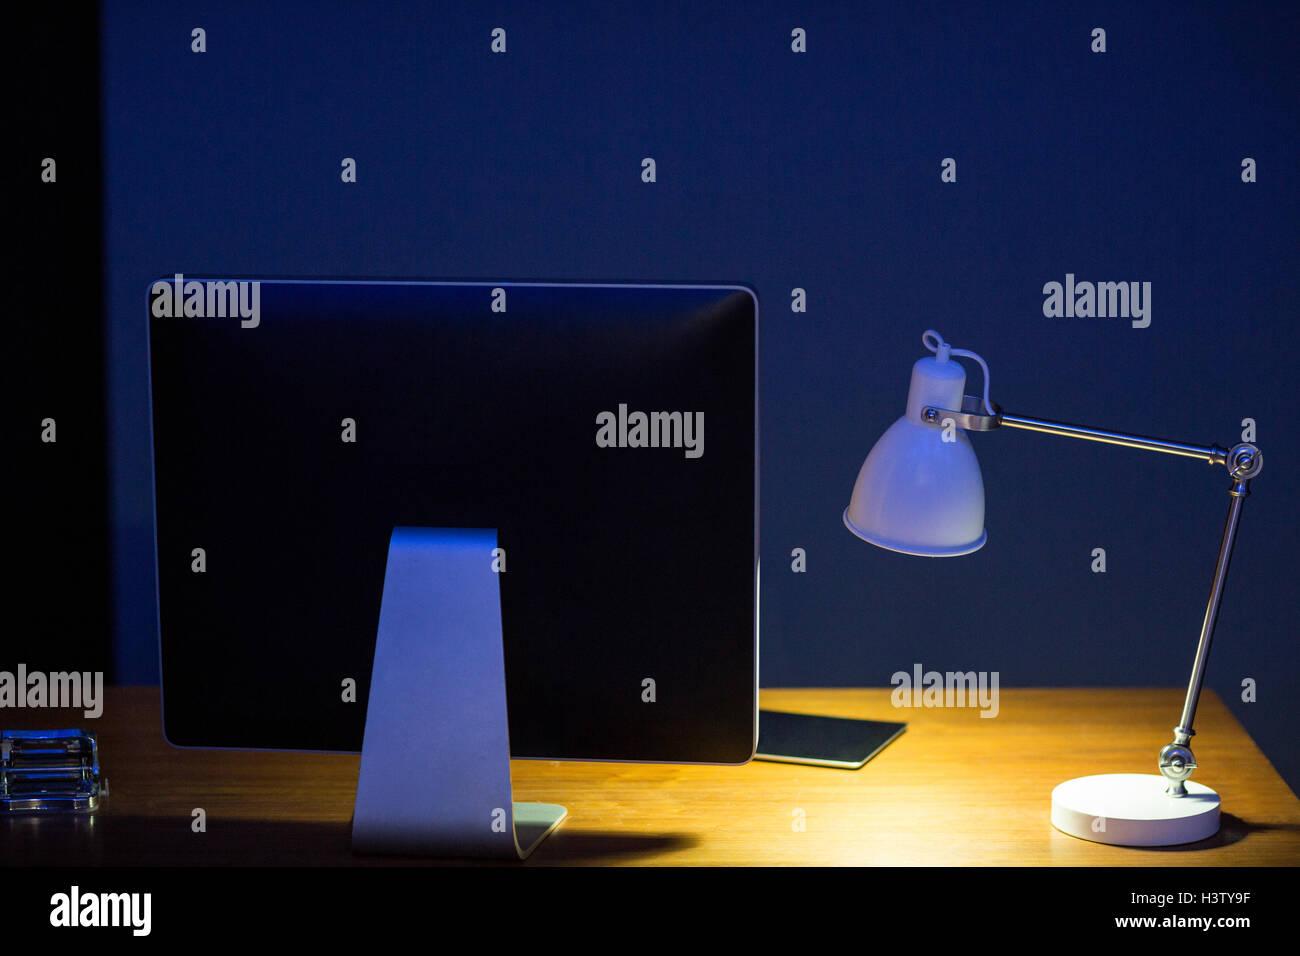 Close-up computer monitor and illuminated lamp - Stock Image